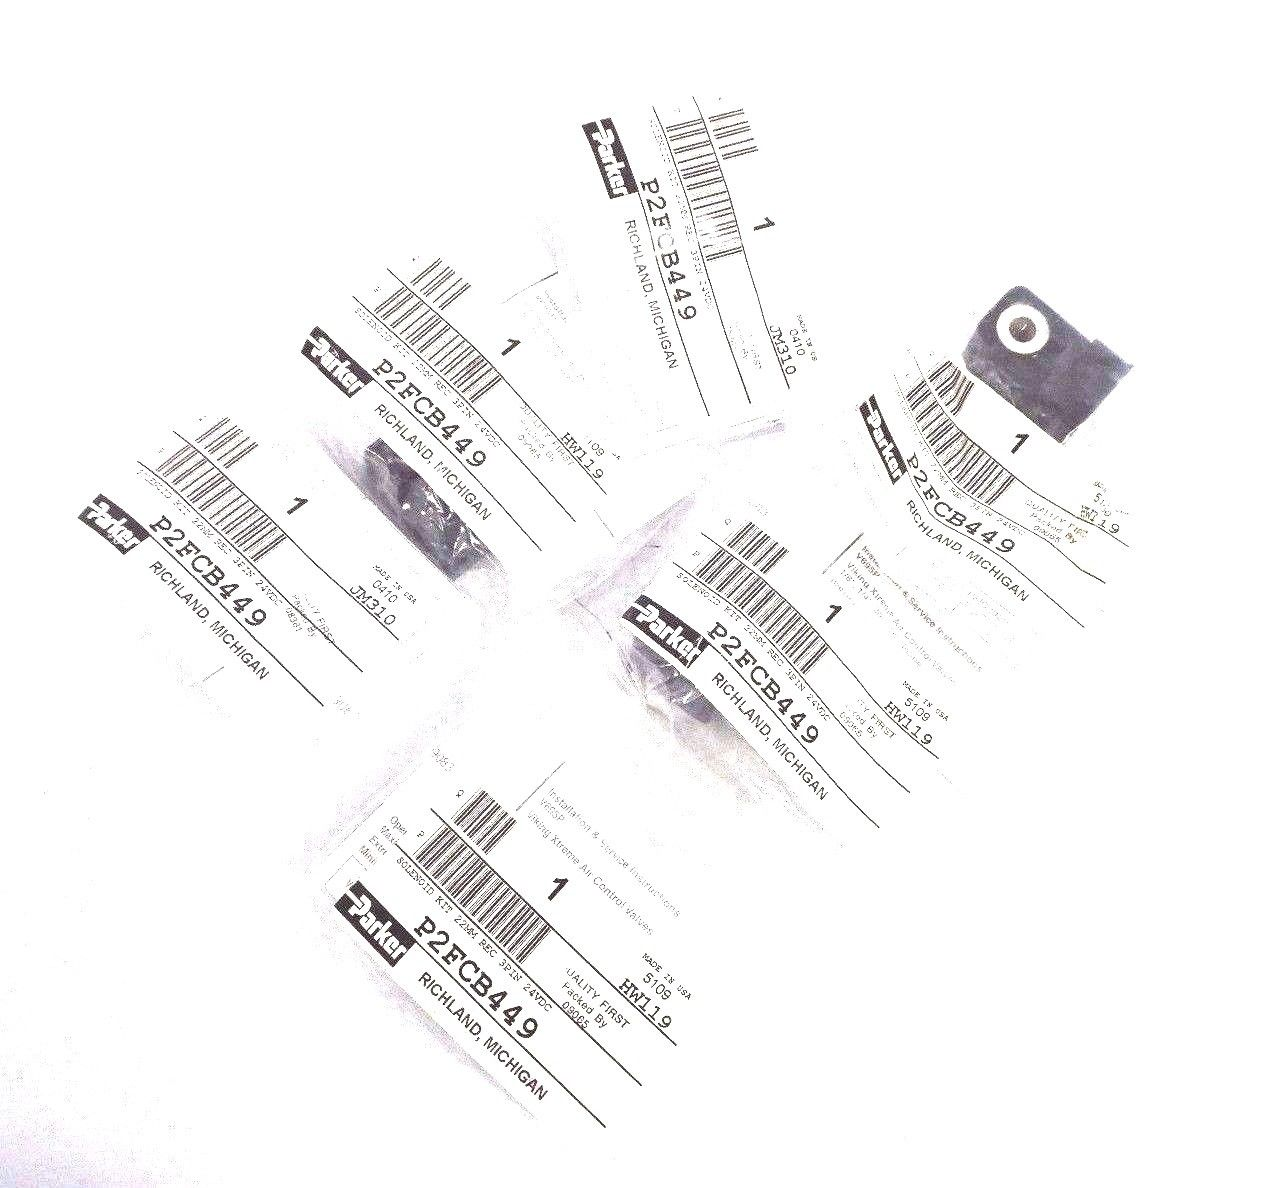 sb industrial supply mro plc equipment parts